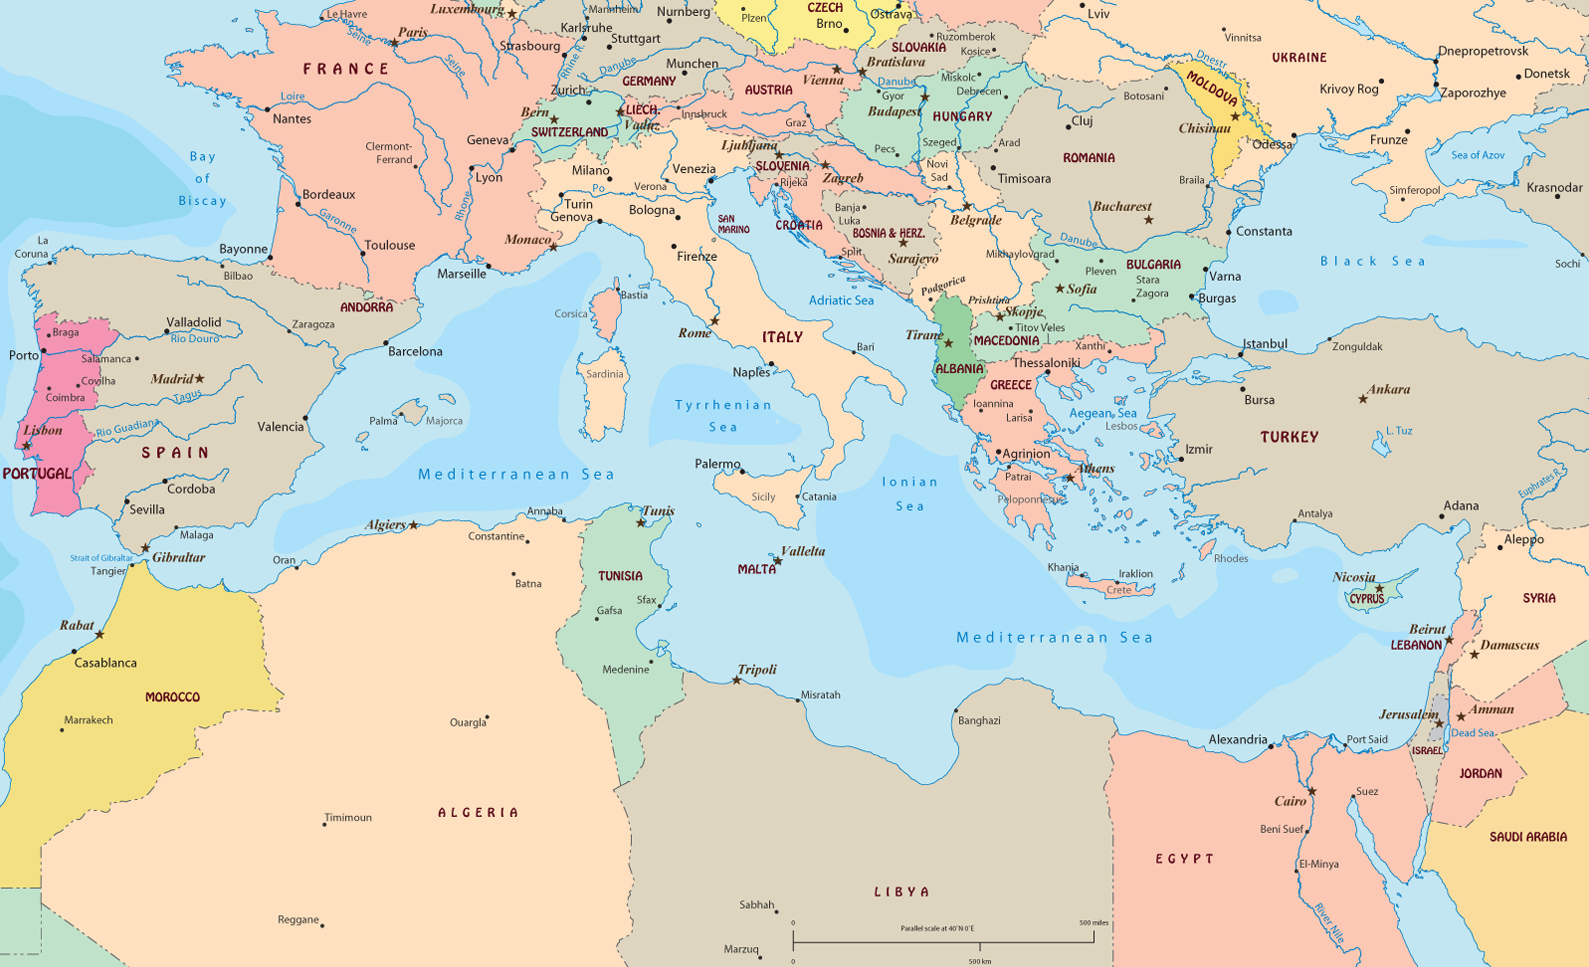 World Map Mediterranean Sea Political Of Region Maps.